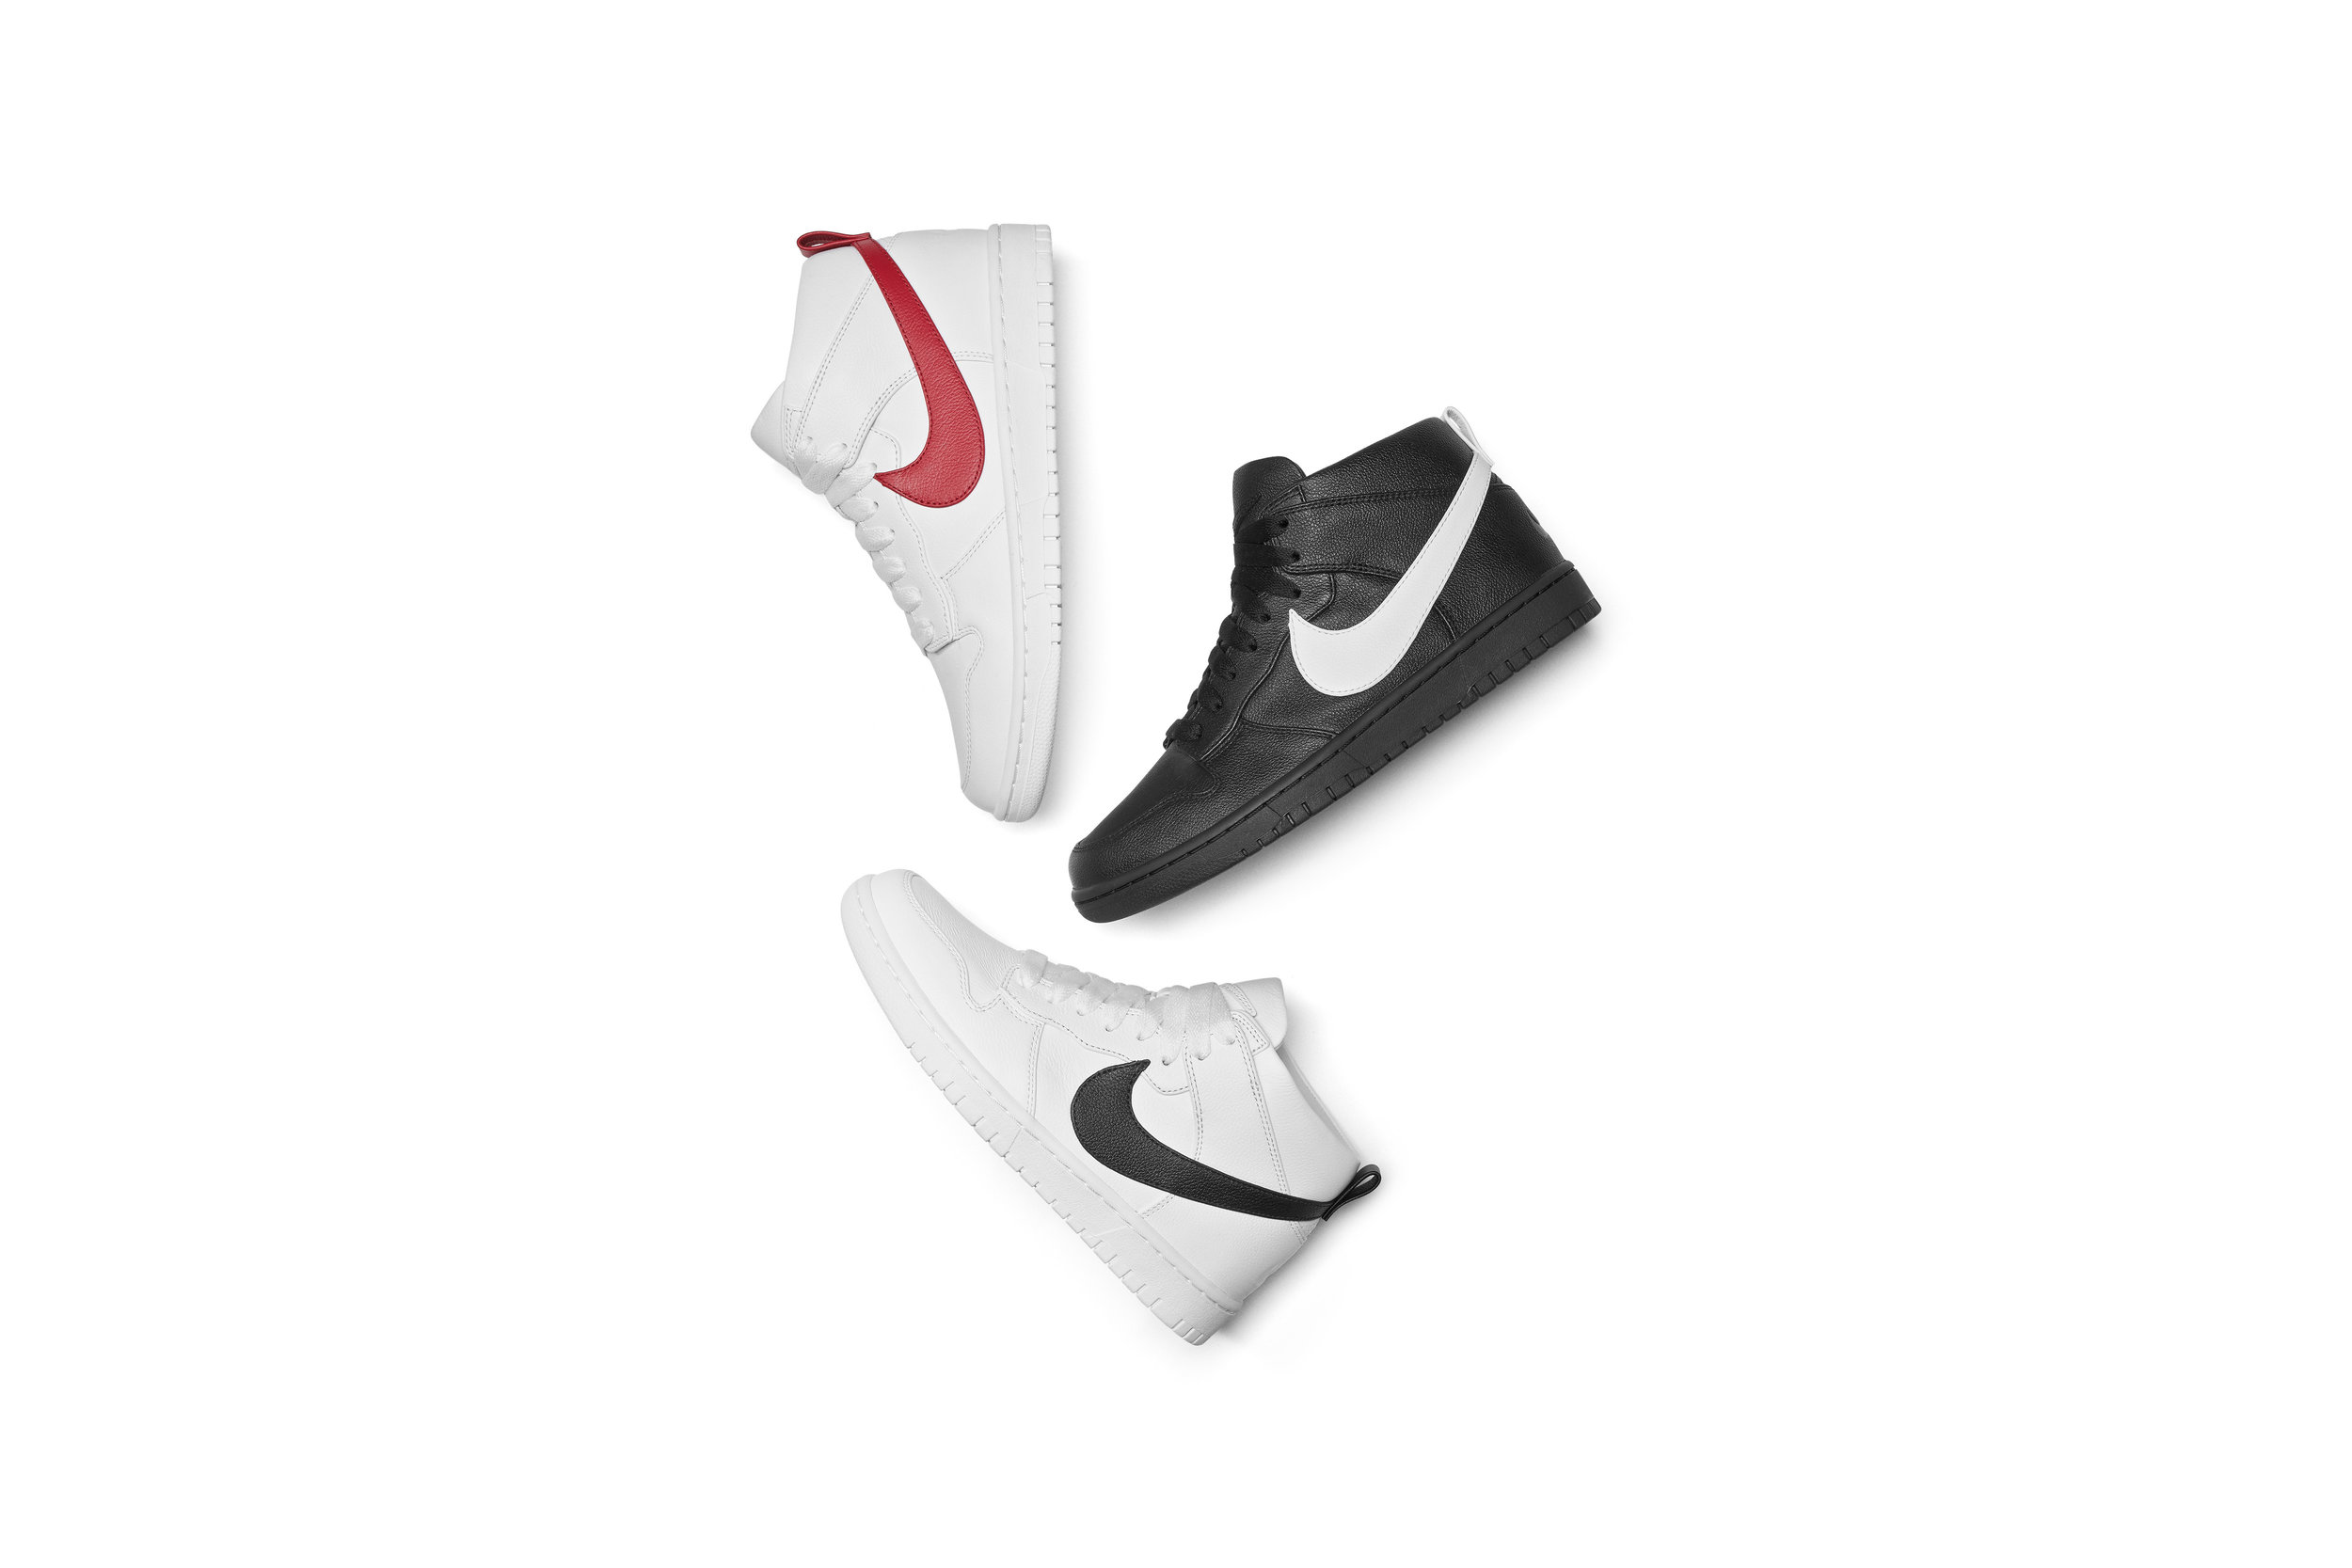 NikeLab_Dunk_Lux_Chukka_RT_7_65806.jpg